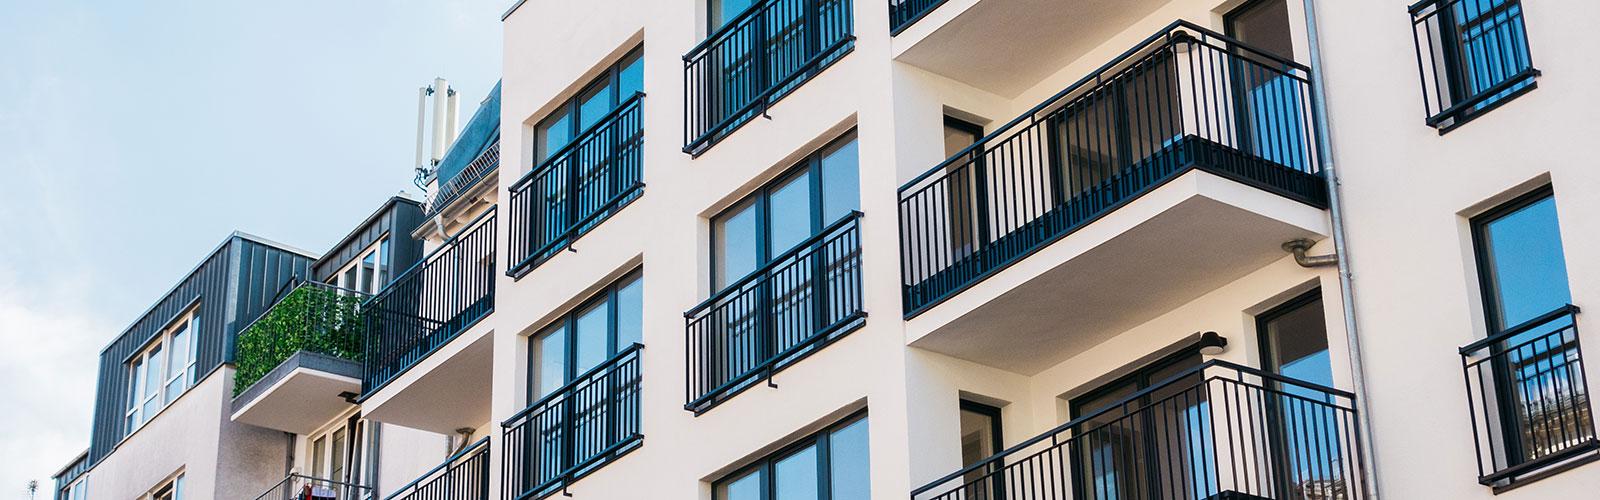 Steuerberatung im Bau- und Immobiliengewerbe